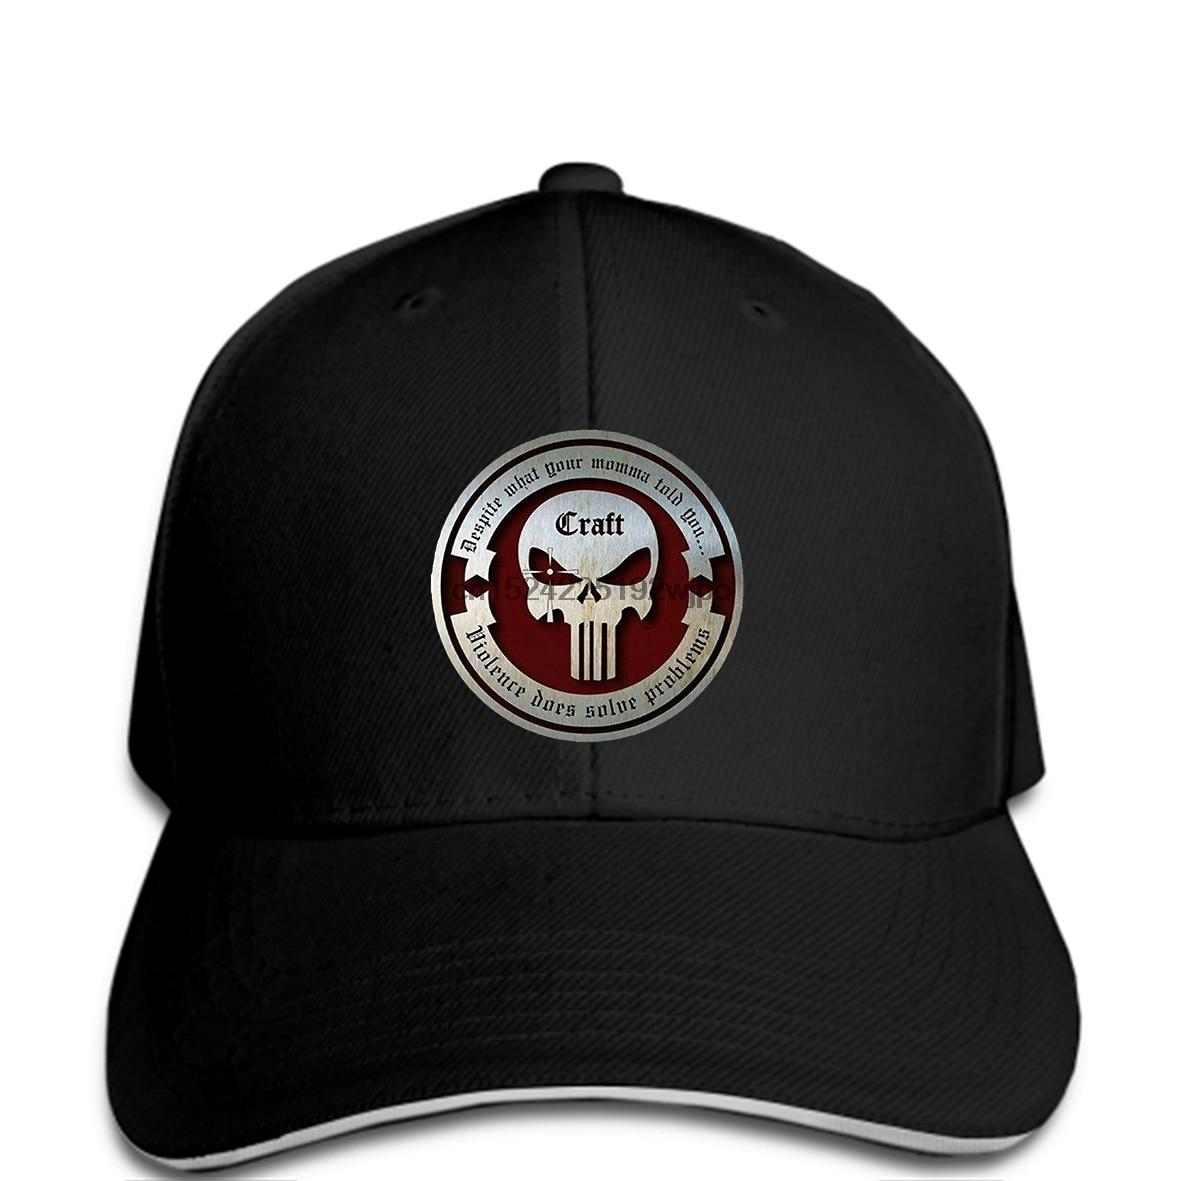 Hittings Chris Kyle Frog Foundation-American Sniper Ajustable Baseball Cap Cotton Black